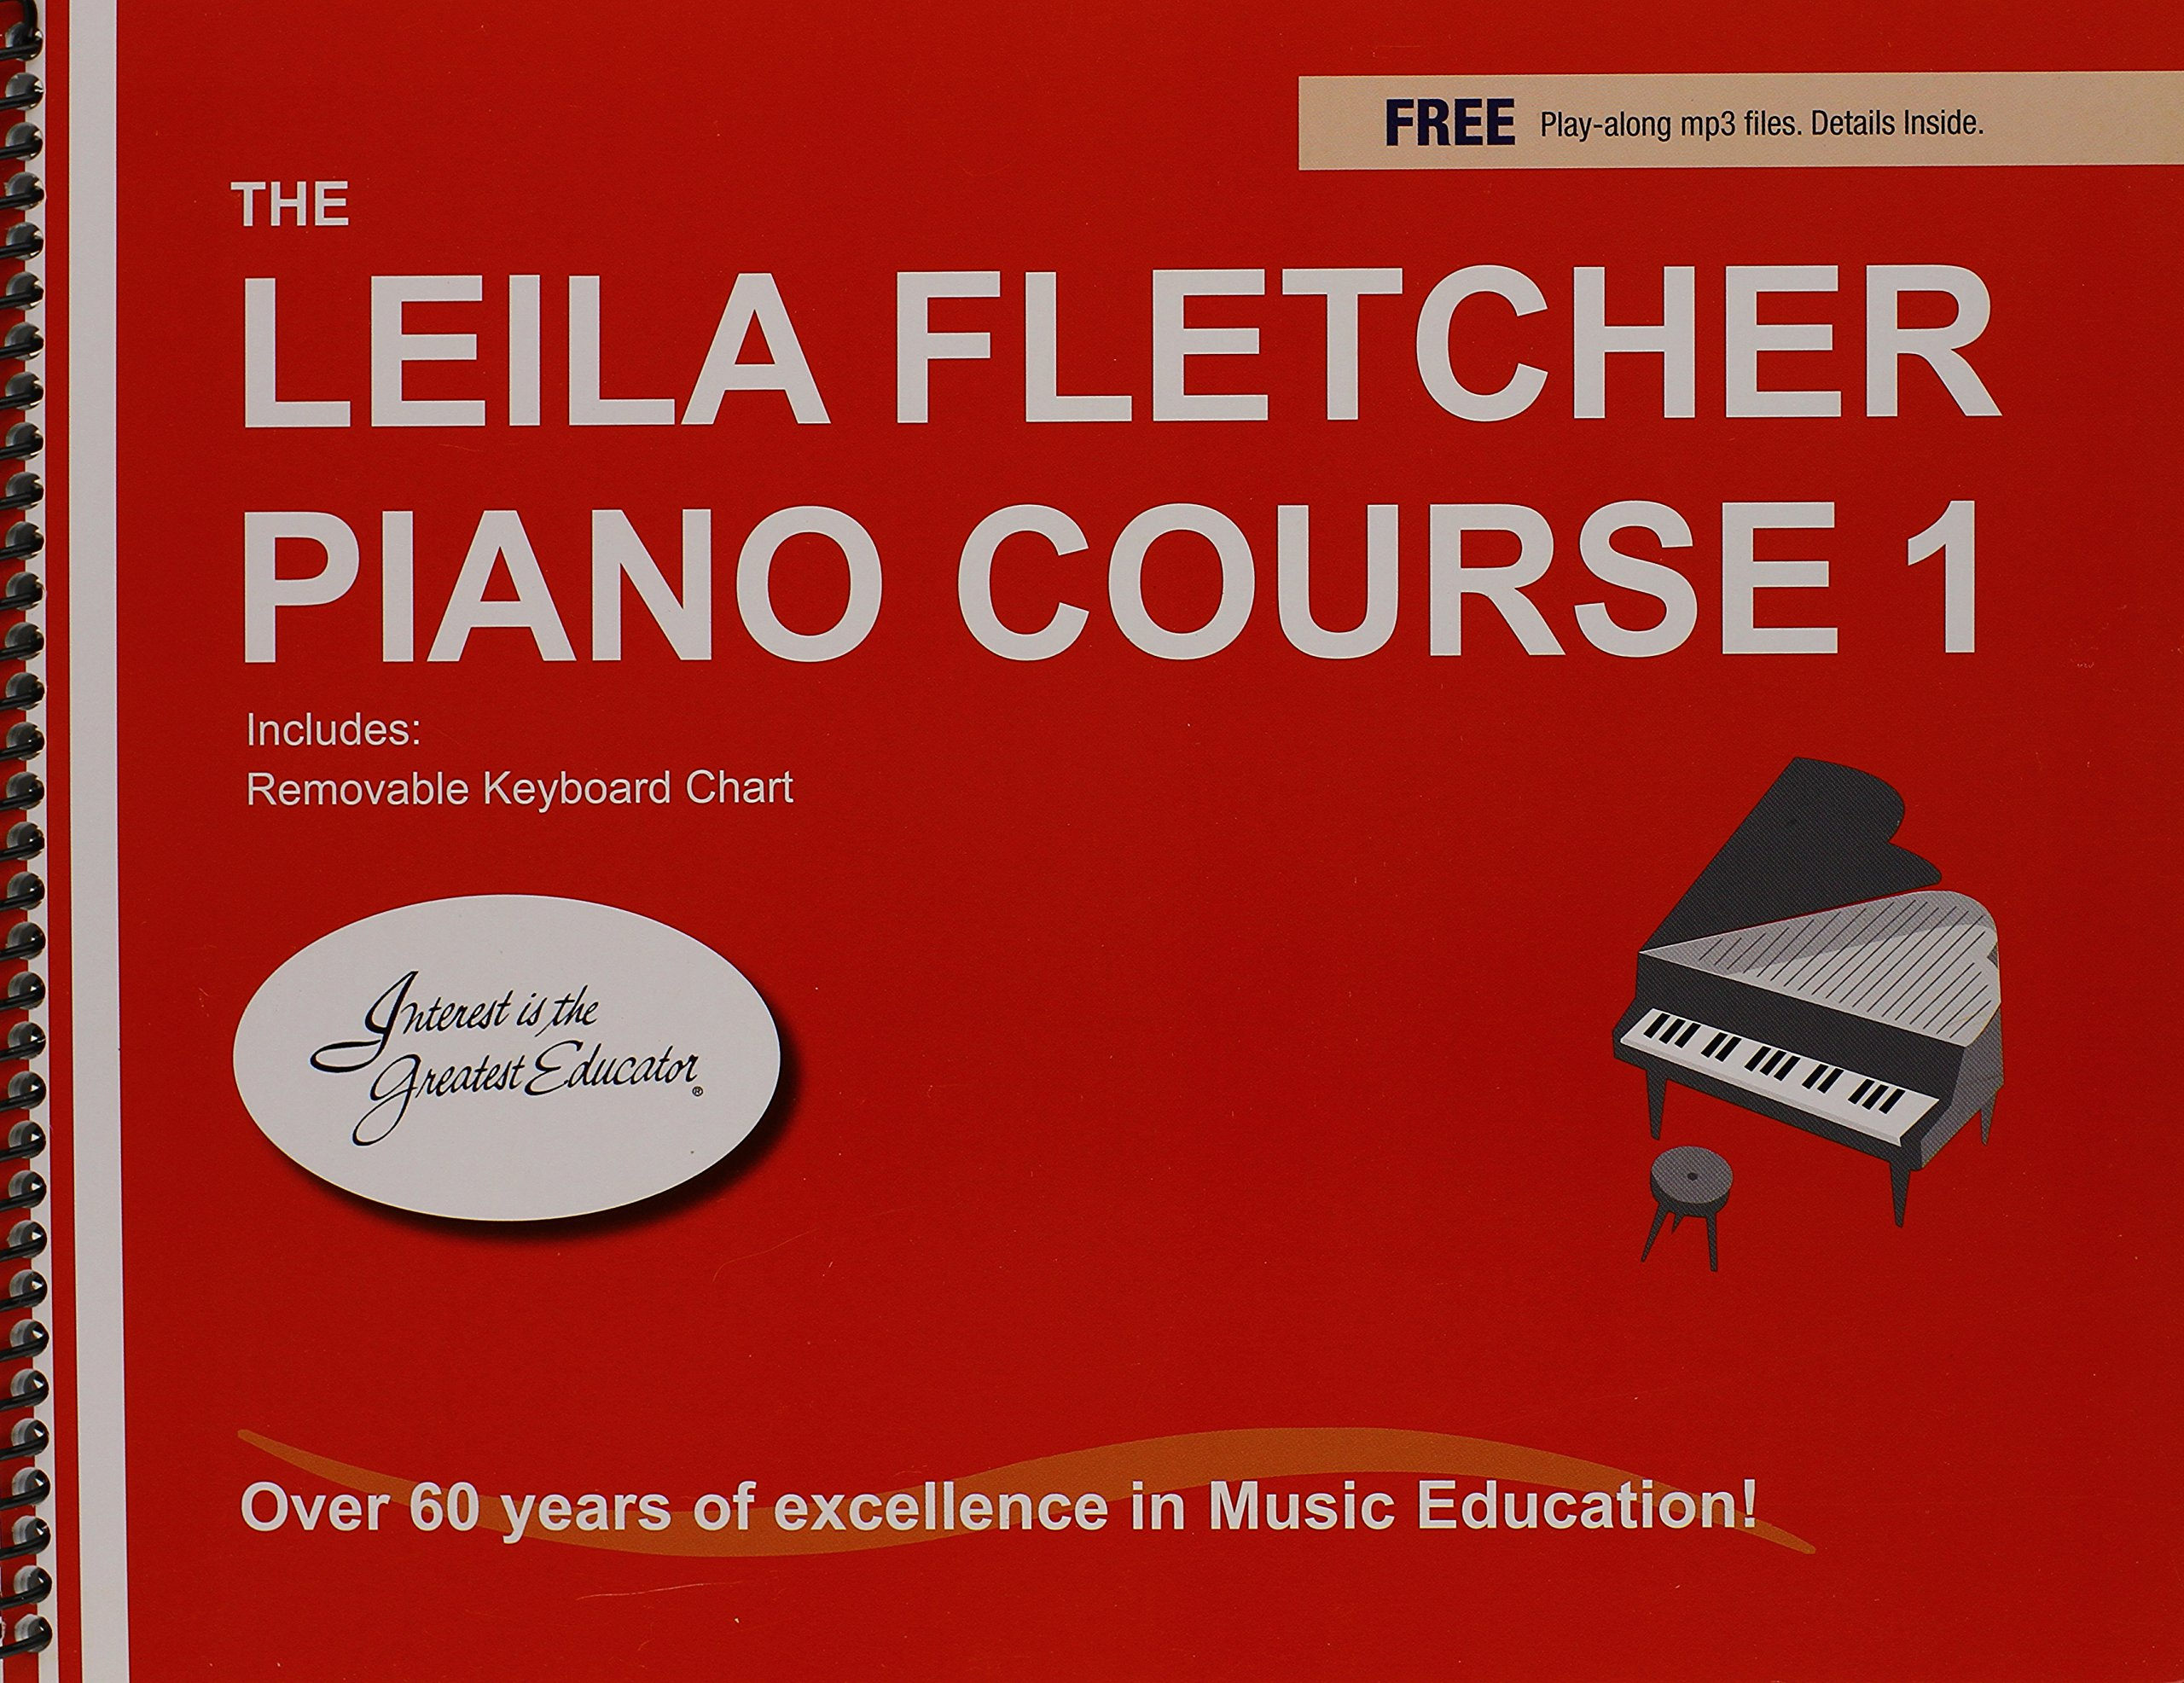 The leila fletcher piano course book 1 leila fletcher the leila fletcher piano course book 1 leila fletcher 0777535010018 amazon books fandeluxe Image collections